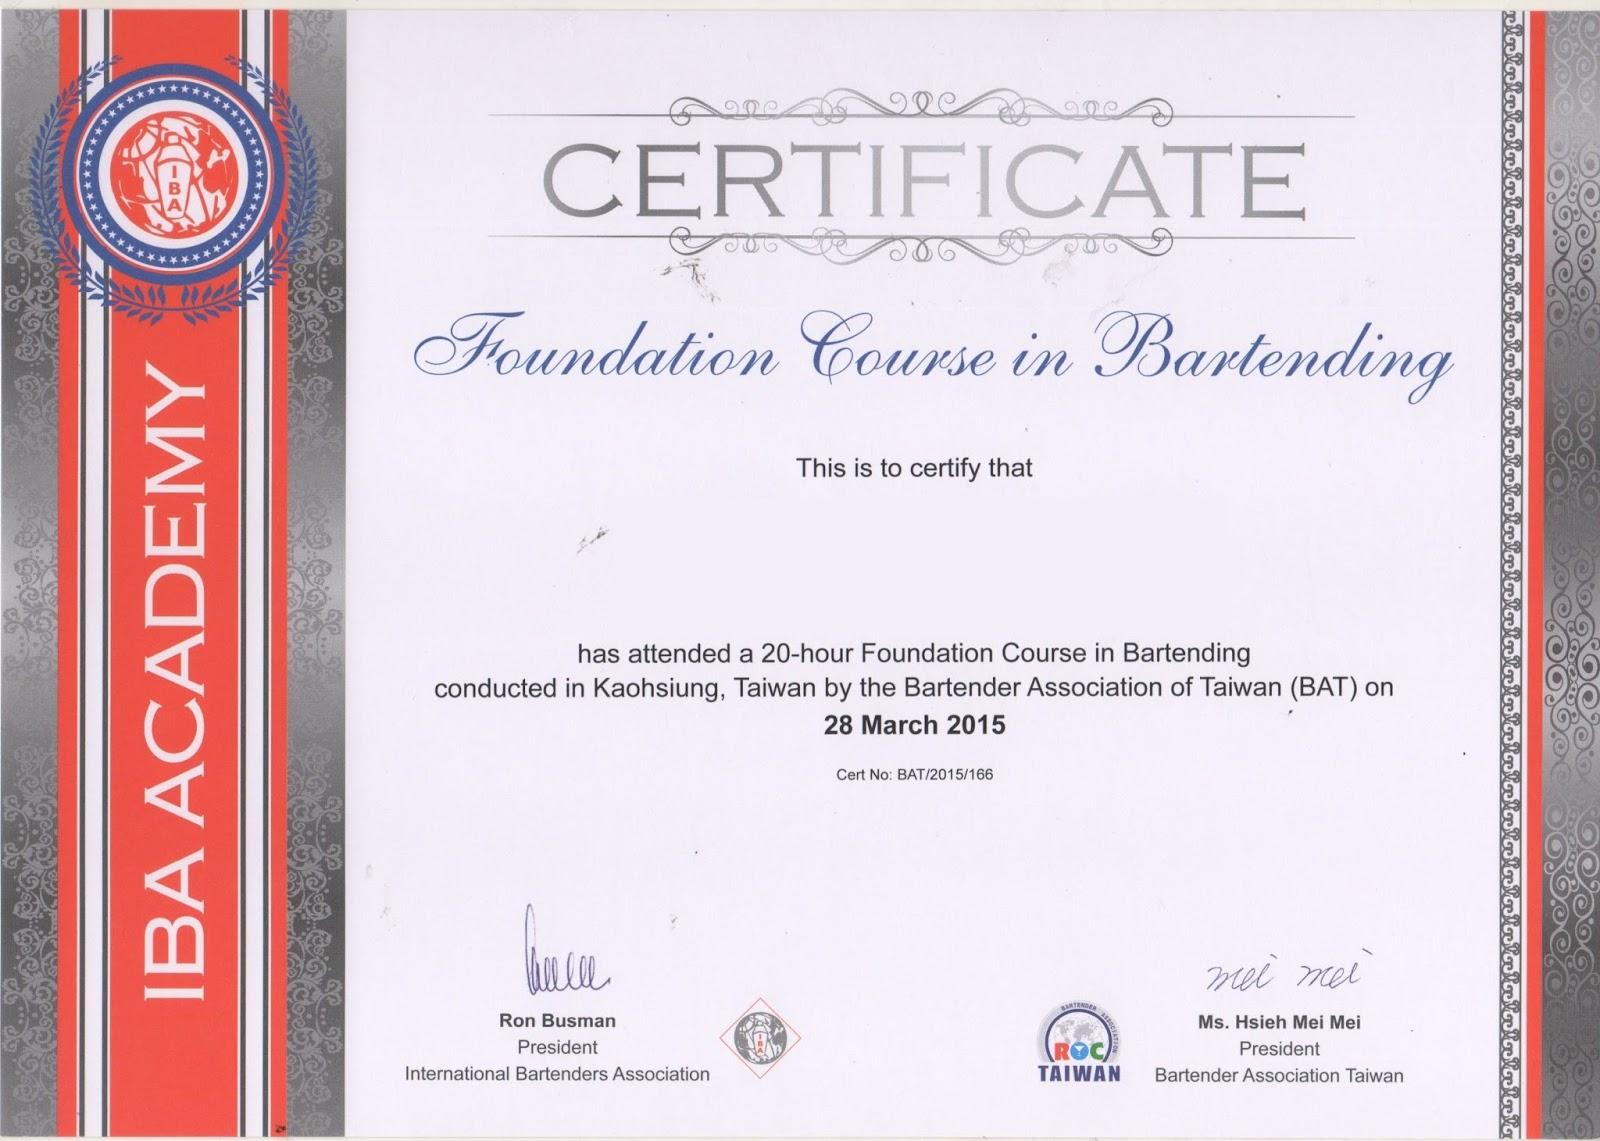 IBA國際專業調酒師初階(第一級)認證課程_證照代碼:6736 ~ 中華民國國際調酒協會